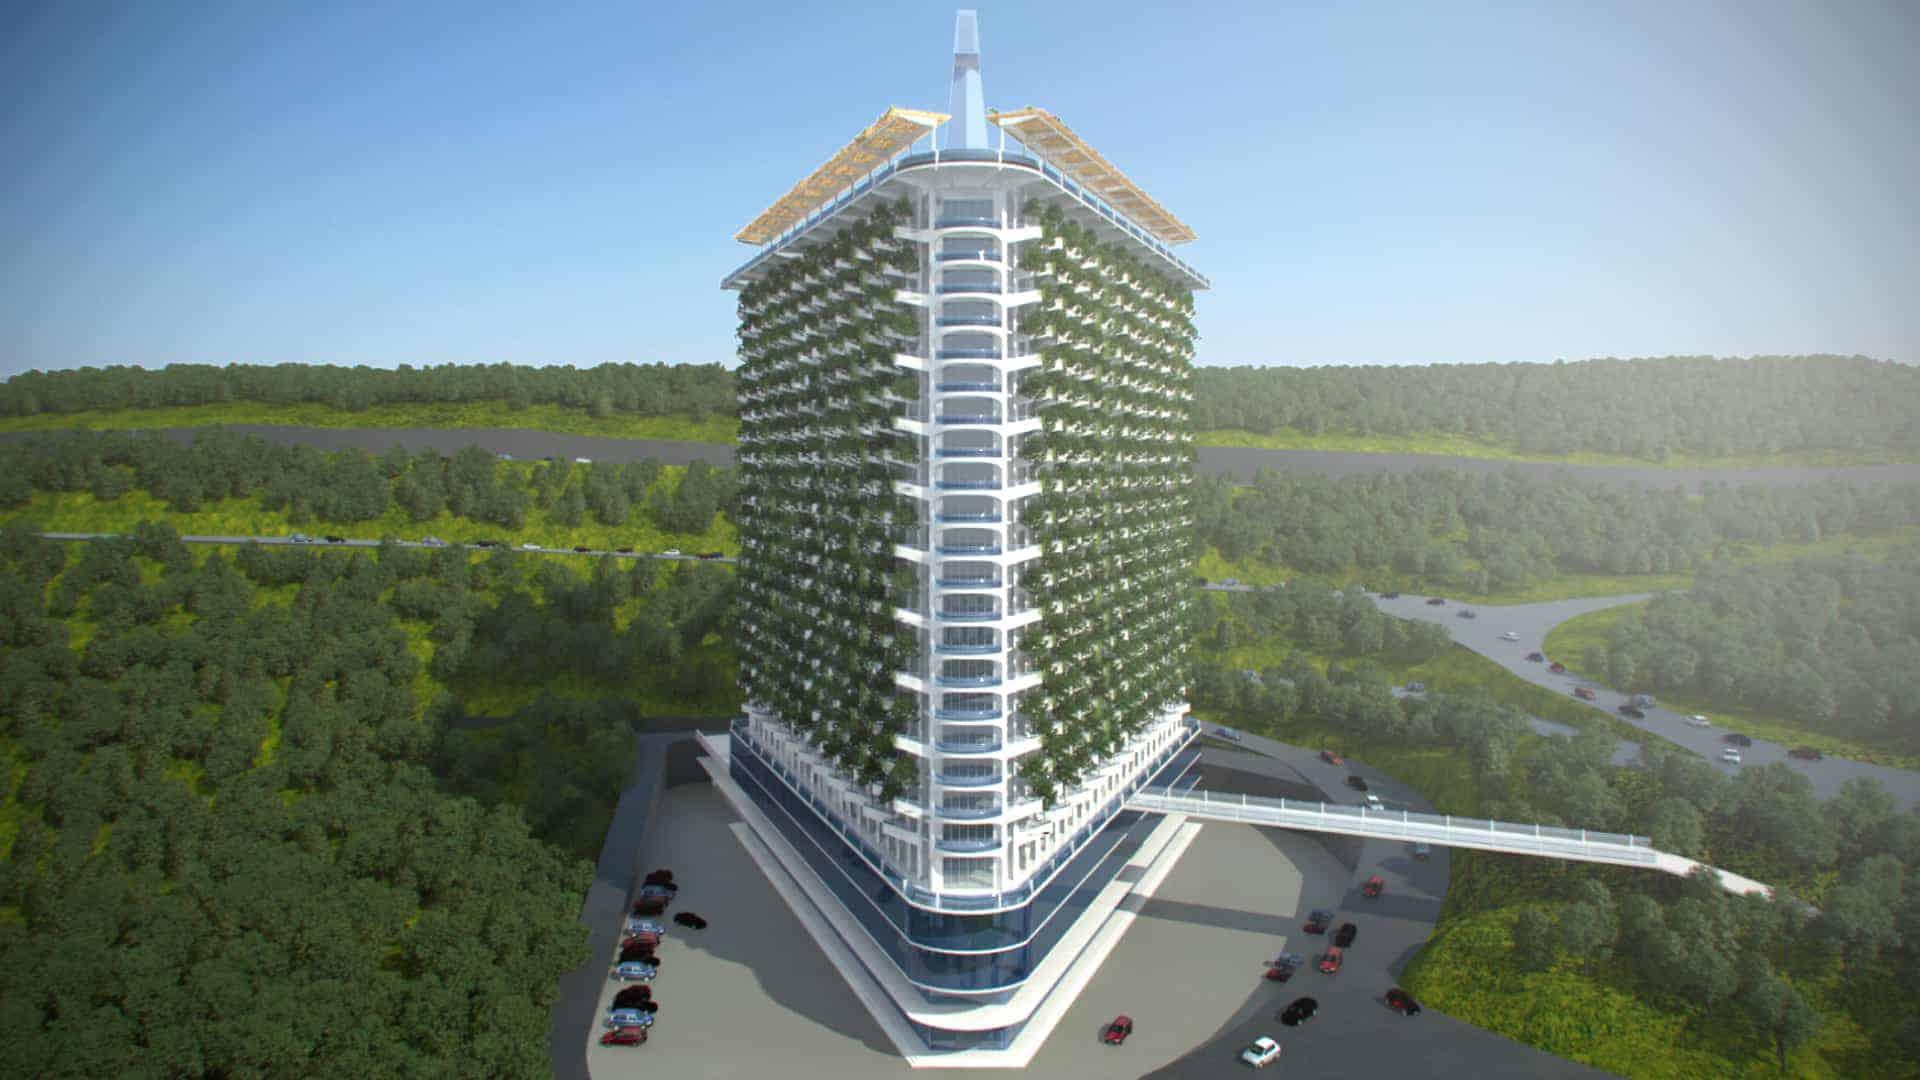 Bio-Architecture Building Concept in Yerevan